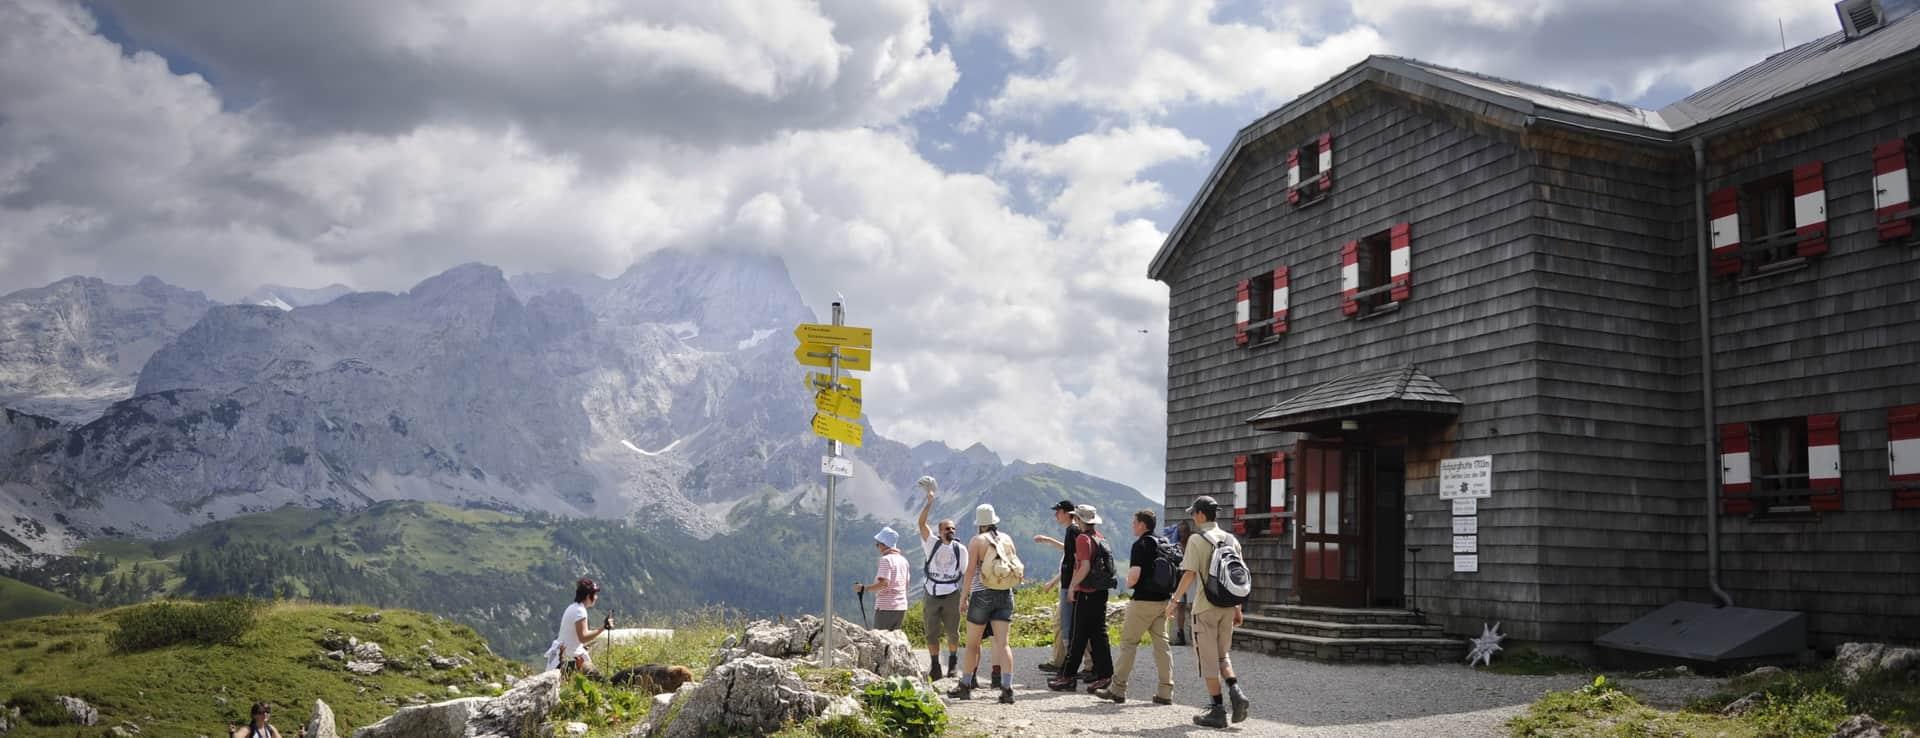 Hofpürglhütte Österrike